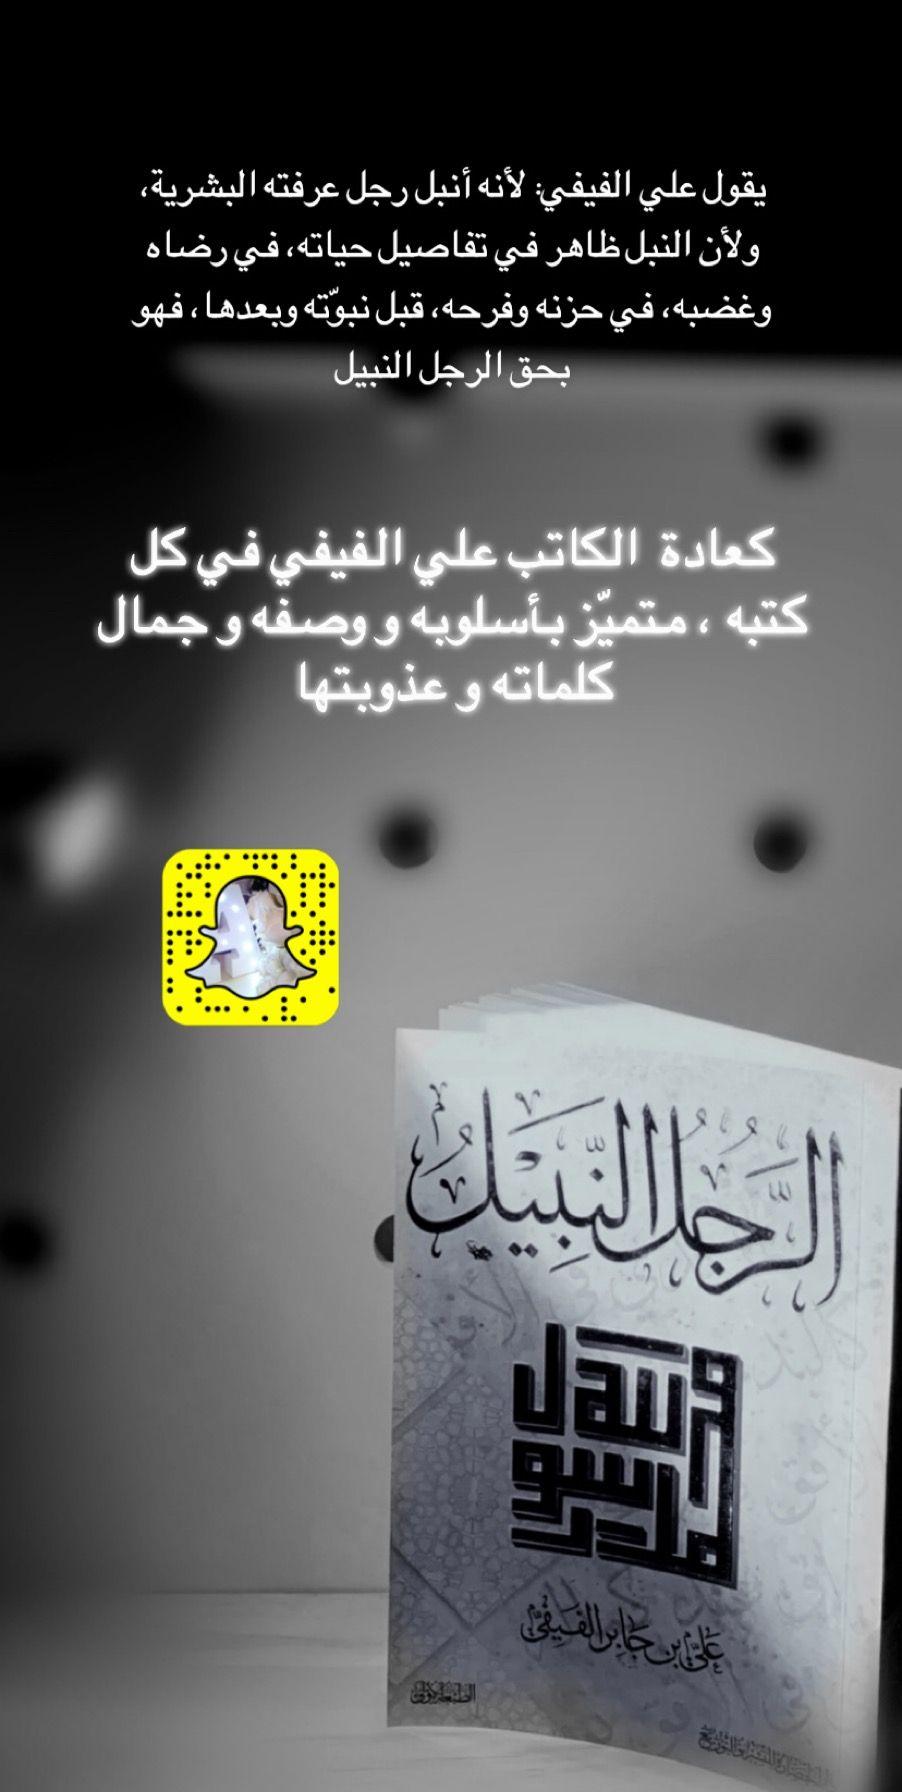 محمد عليه السلام Quotes Usc